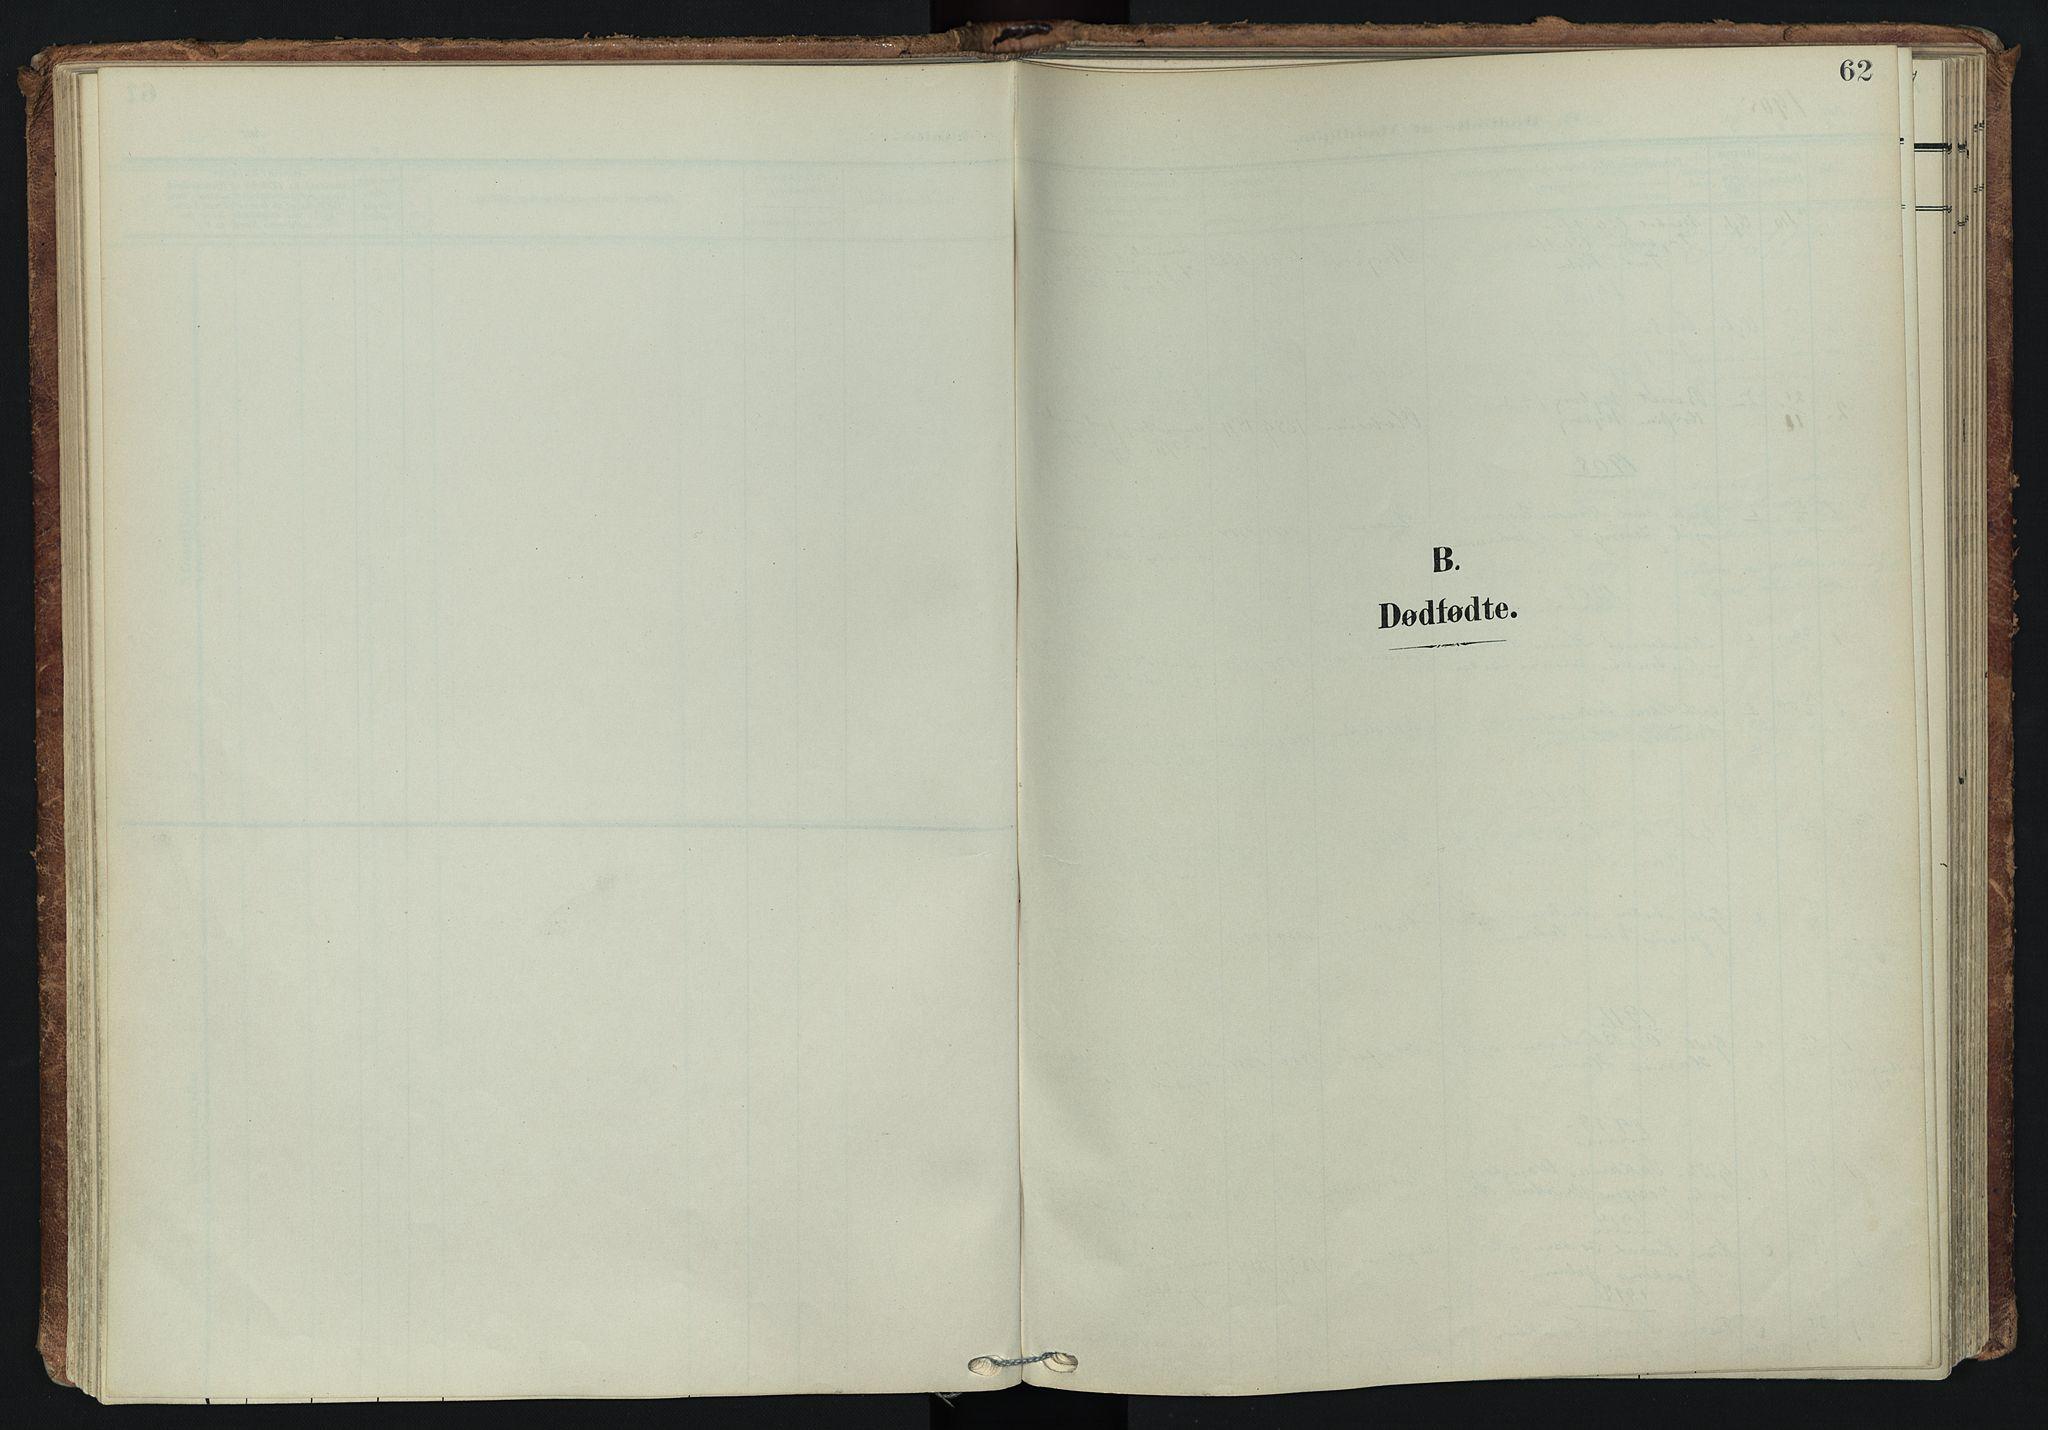 SATØ, Tranøy sokneprestkontor, I/Ia/Iaa/L0014kirke: Ministerialbok nr. 14, 1905-1919, s. 62